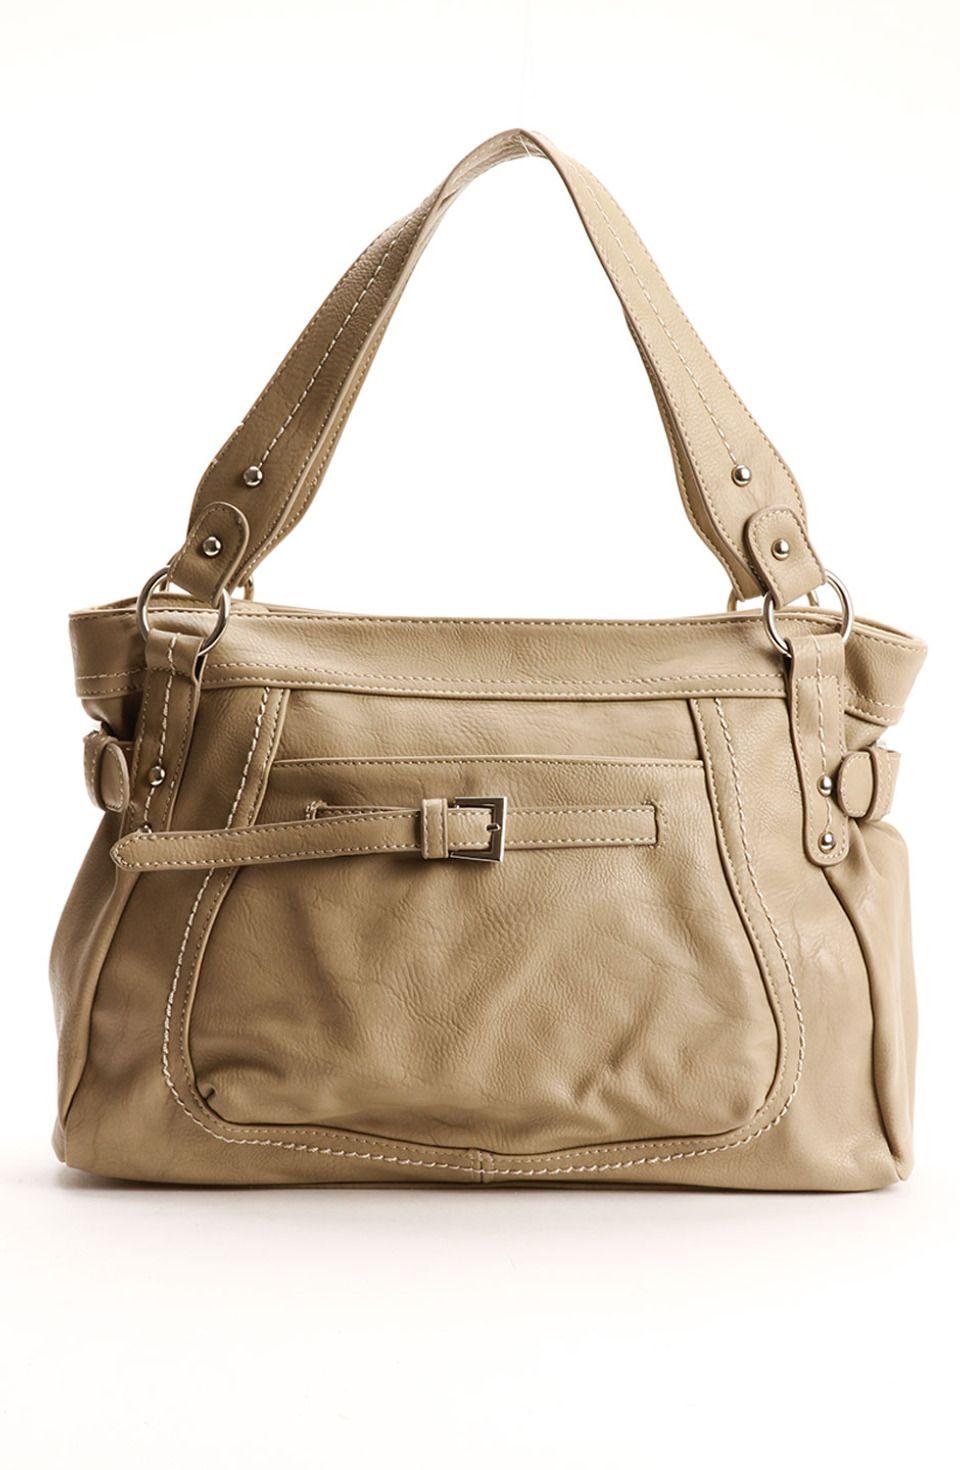 Le Sac Handbag Brand Shoulder Bag Handbags